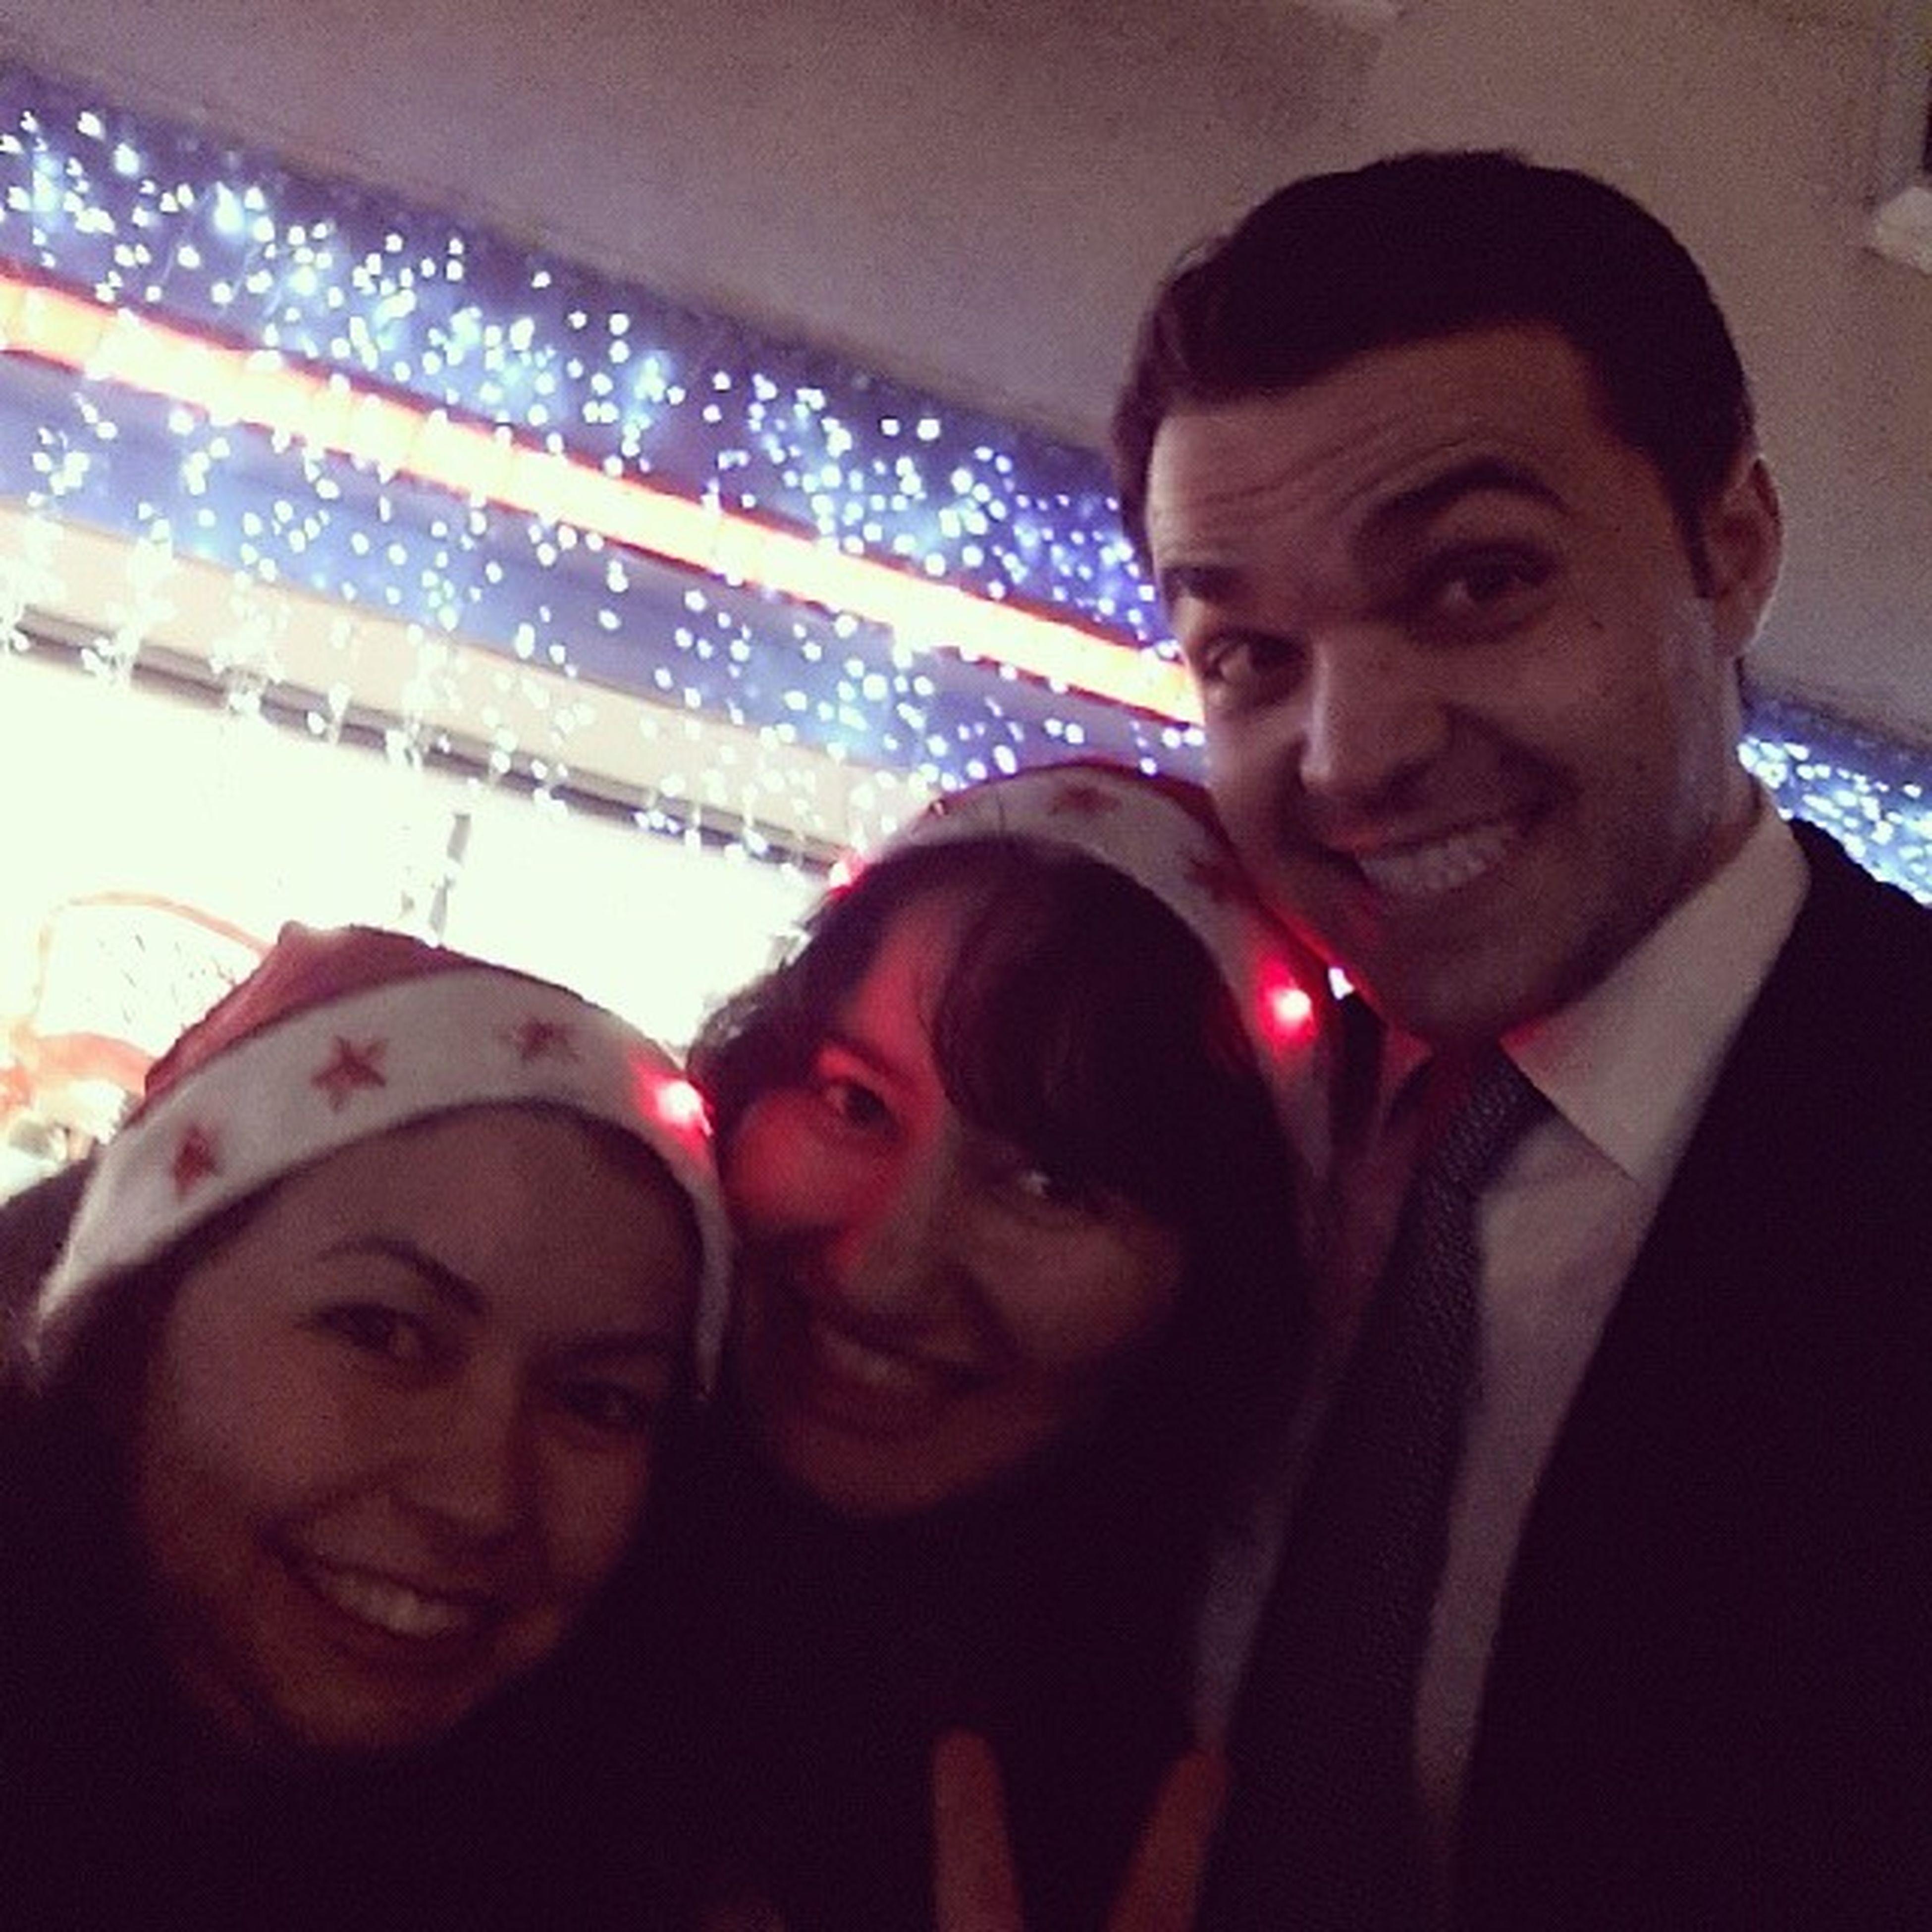 2014 NewYear Akinco Smile iyigunlertotal